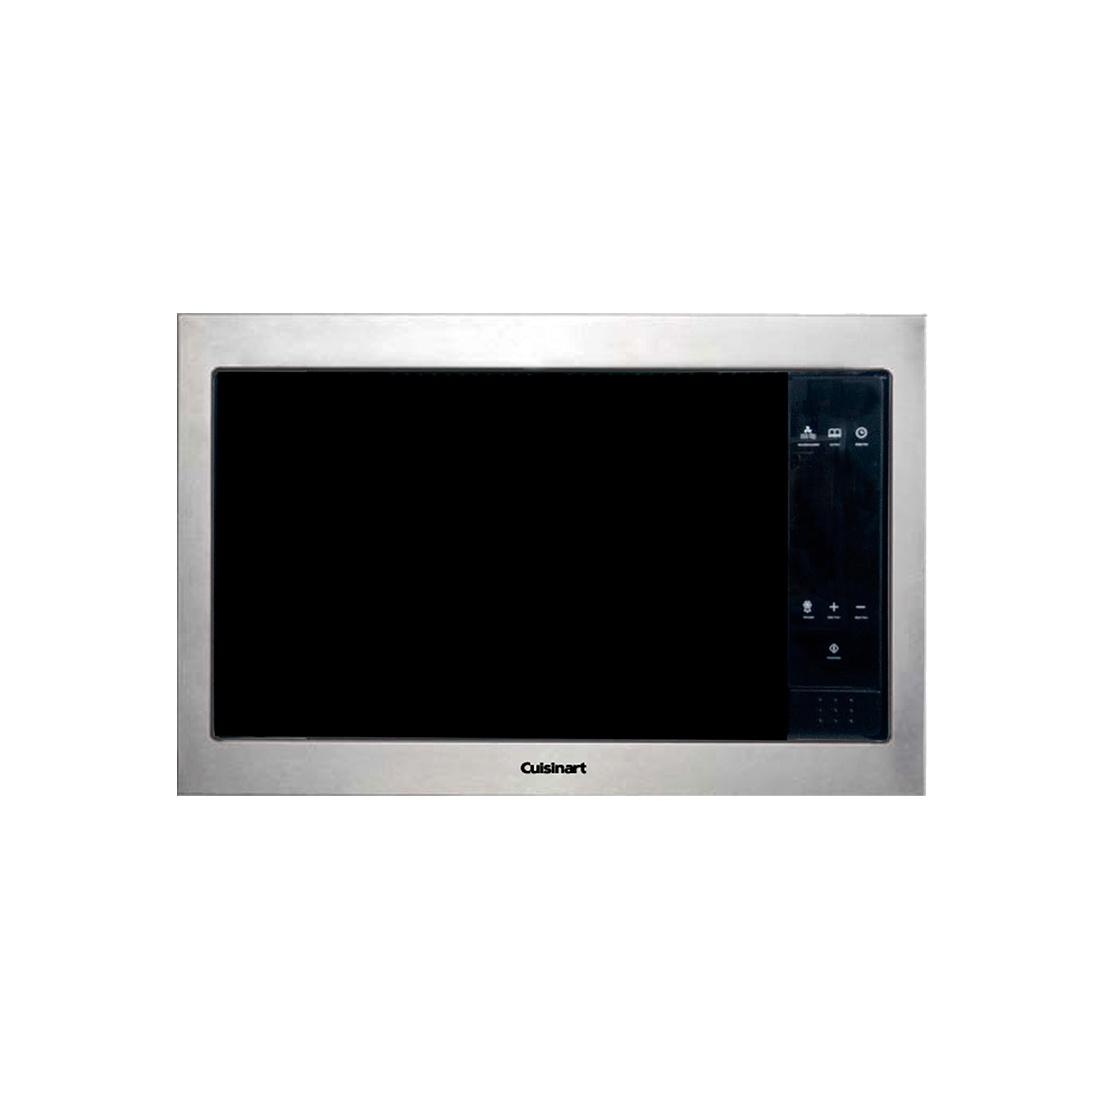 Forno Micro-ondas Cuisinart Arkton com Grill Elétrico Inox 60cm 31 Litros 220V